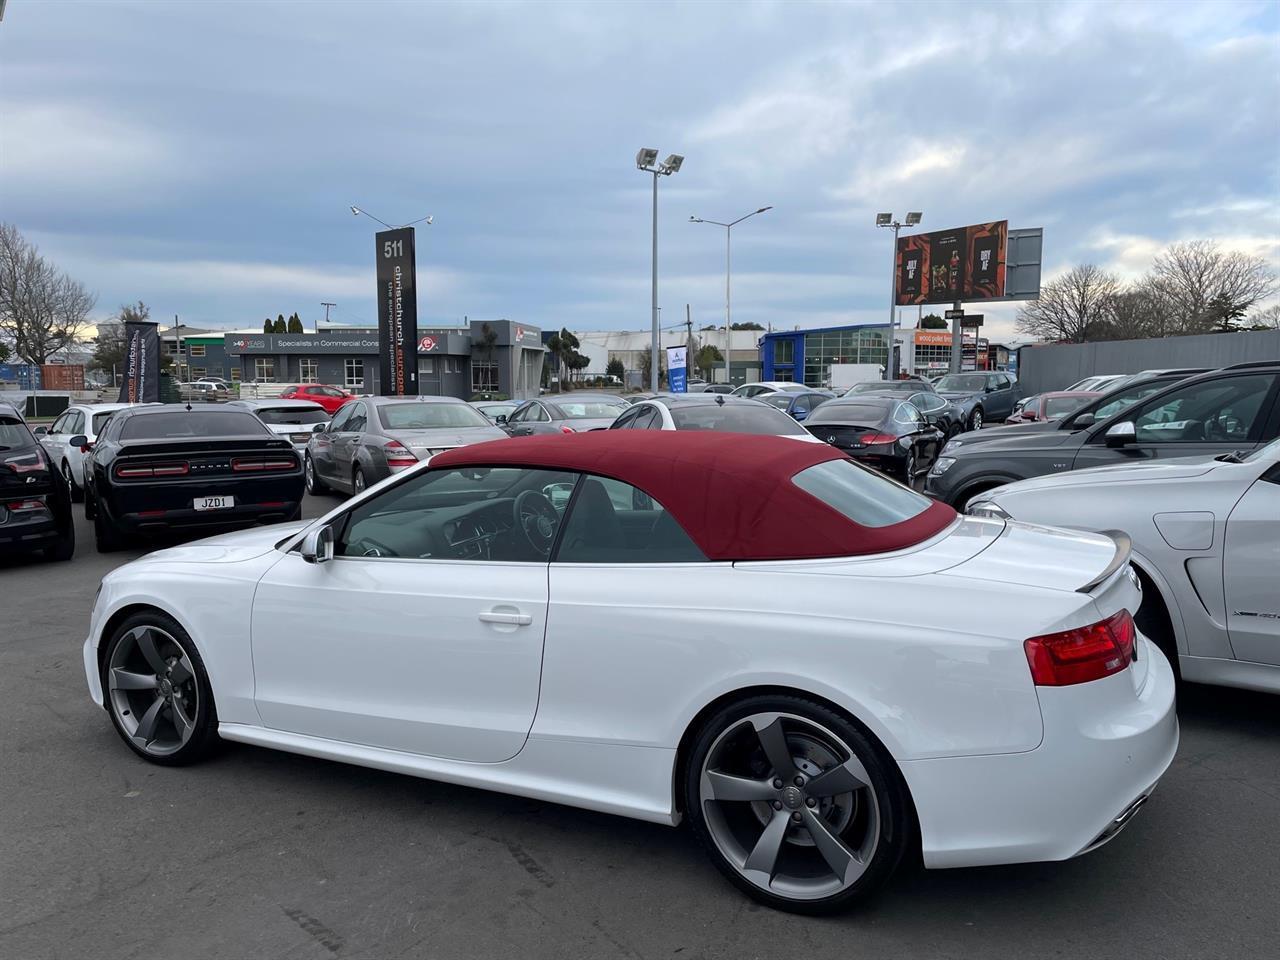 image-14, 2013 Audi RS5 4.2 V8 FSI Facelift Convertible at Christchurch